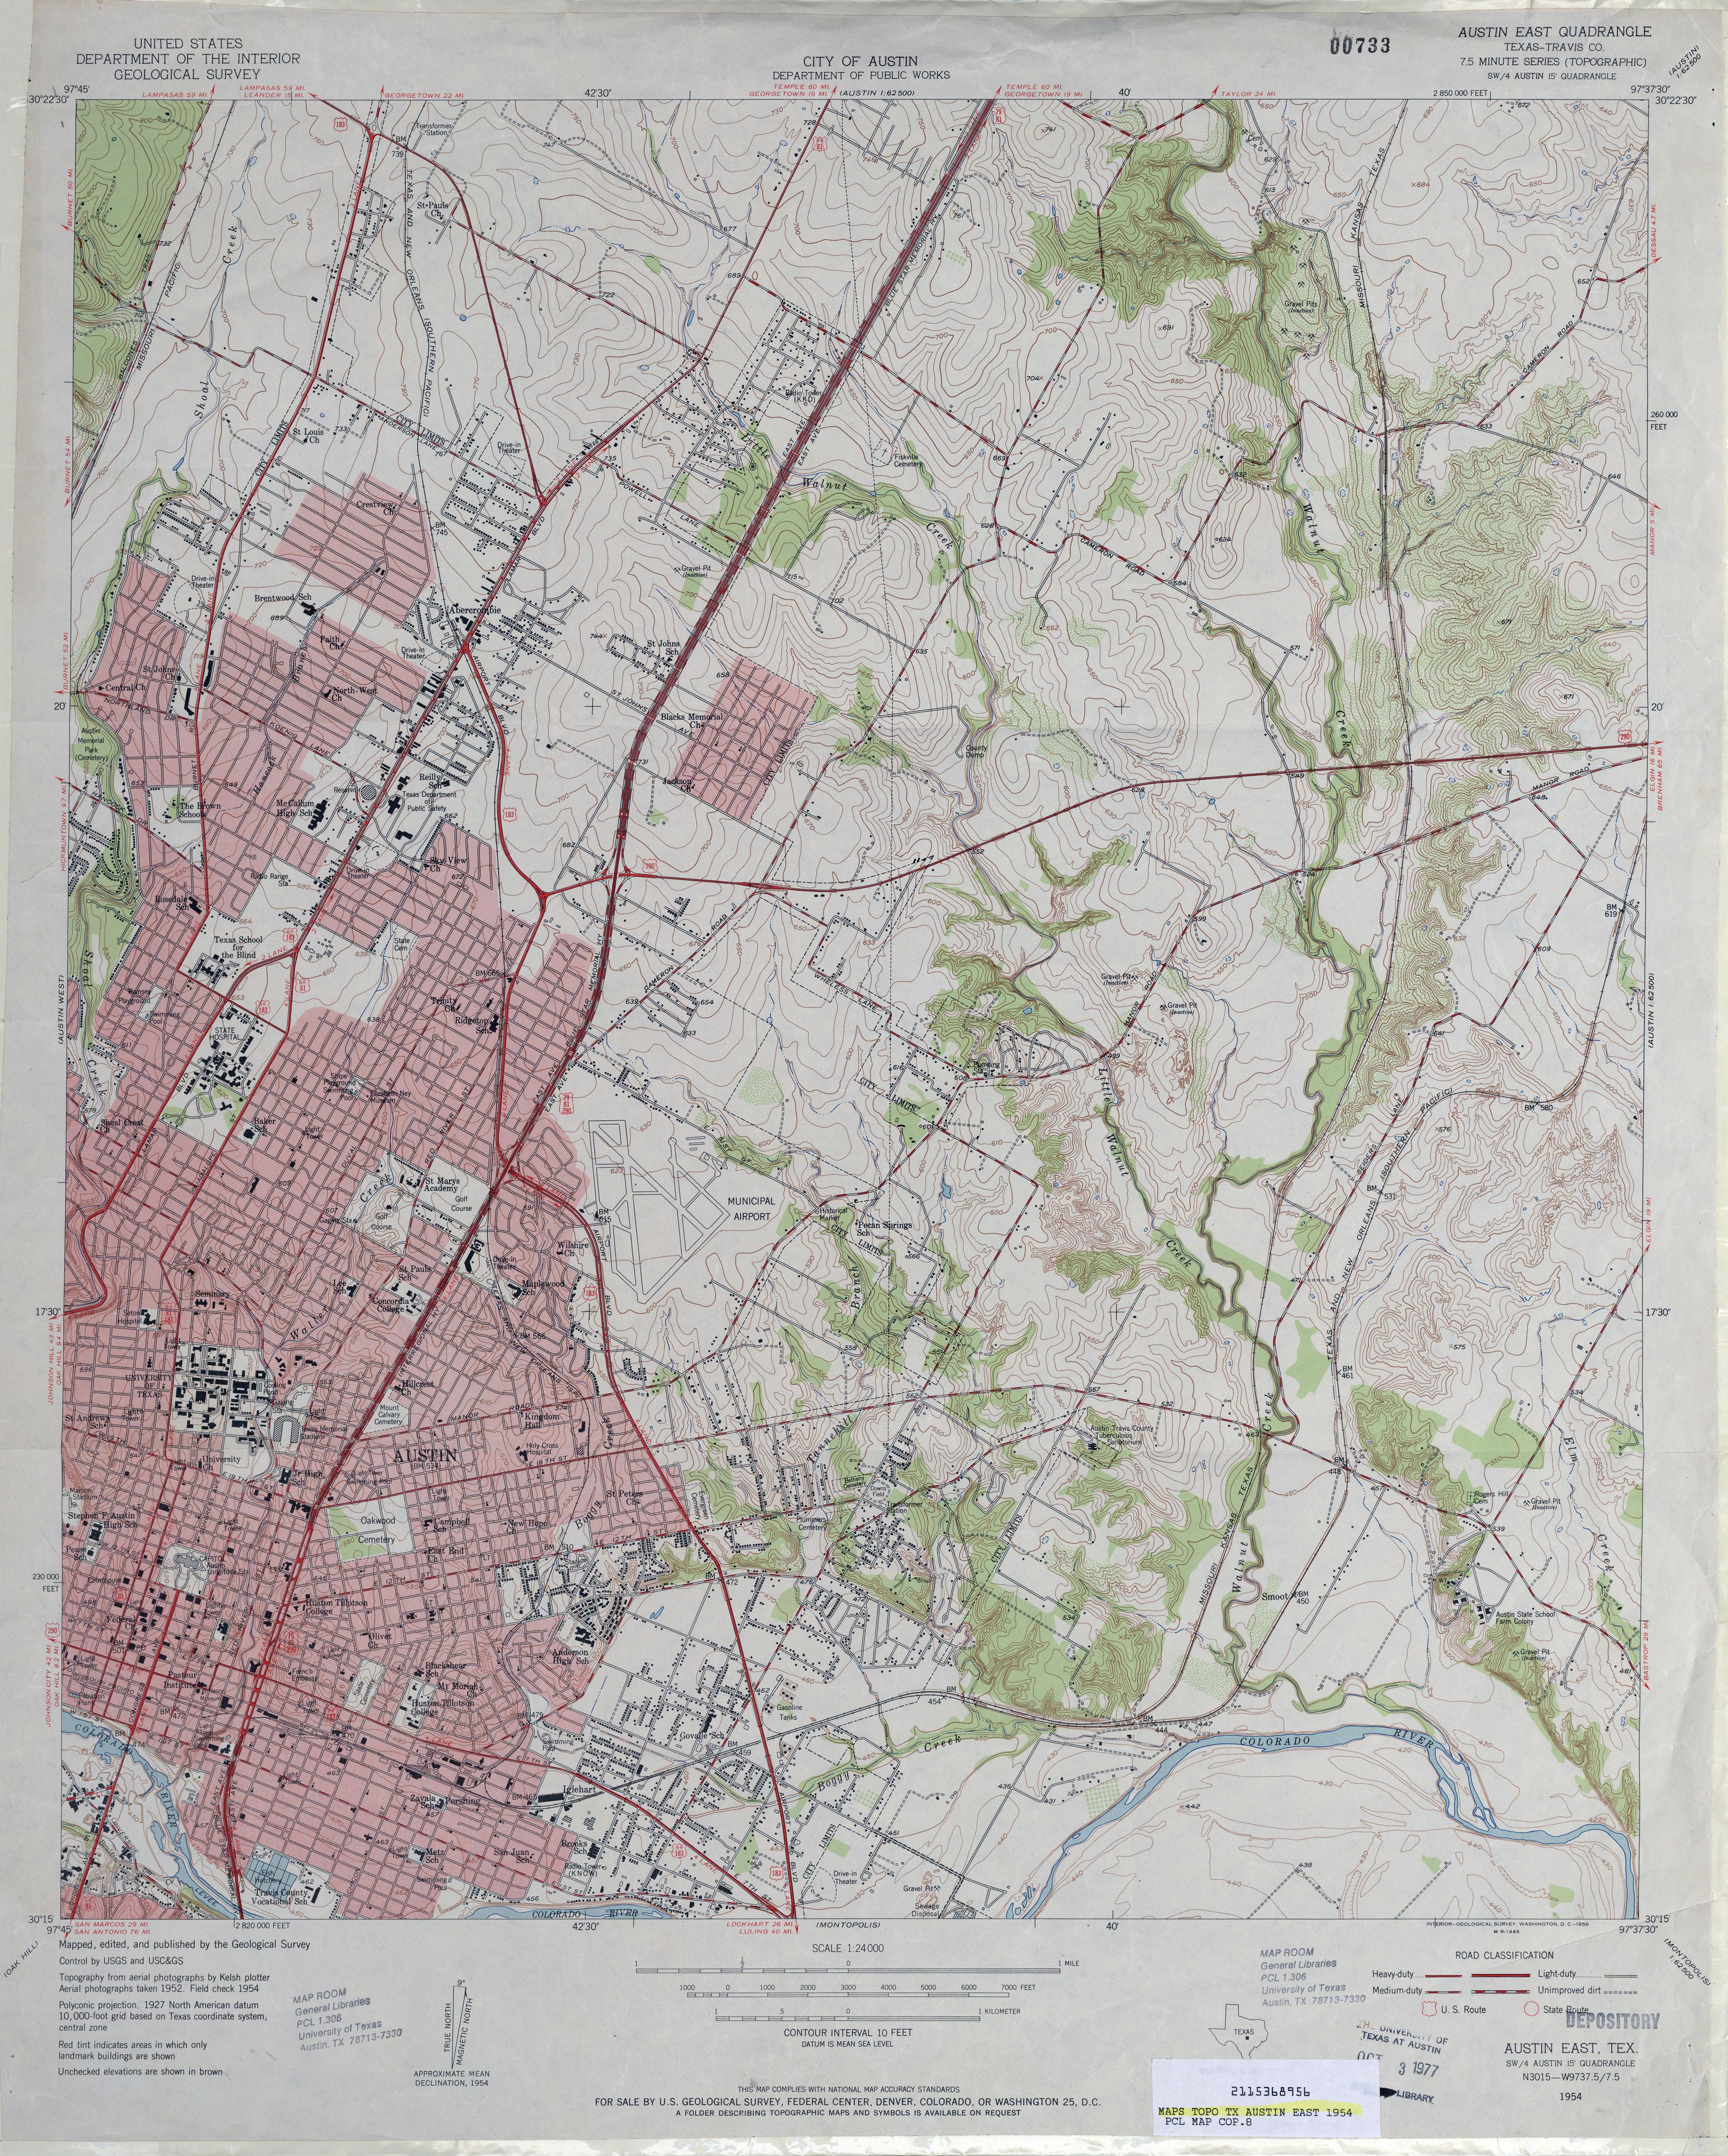 Austin Texas Topographic Maps PerryCastaeda Map Collection UT